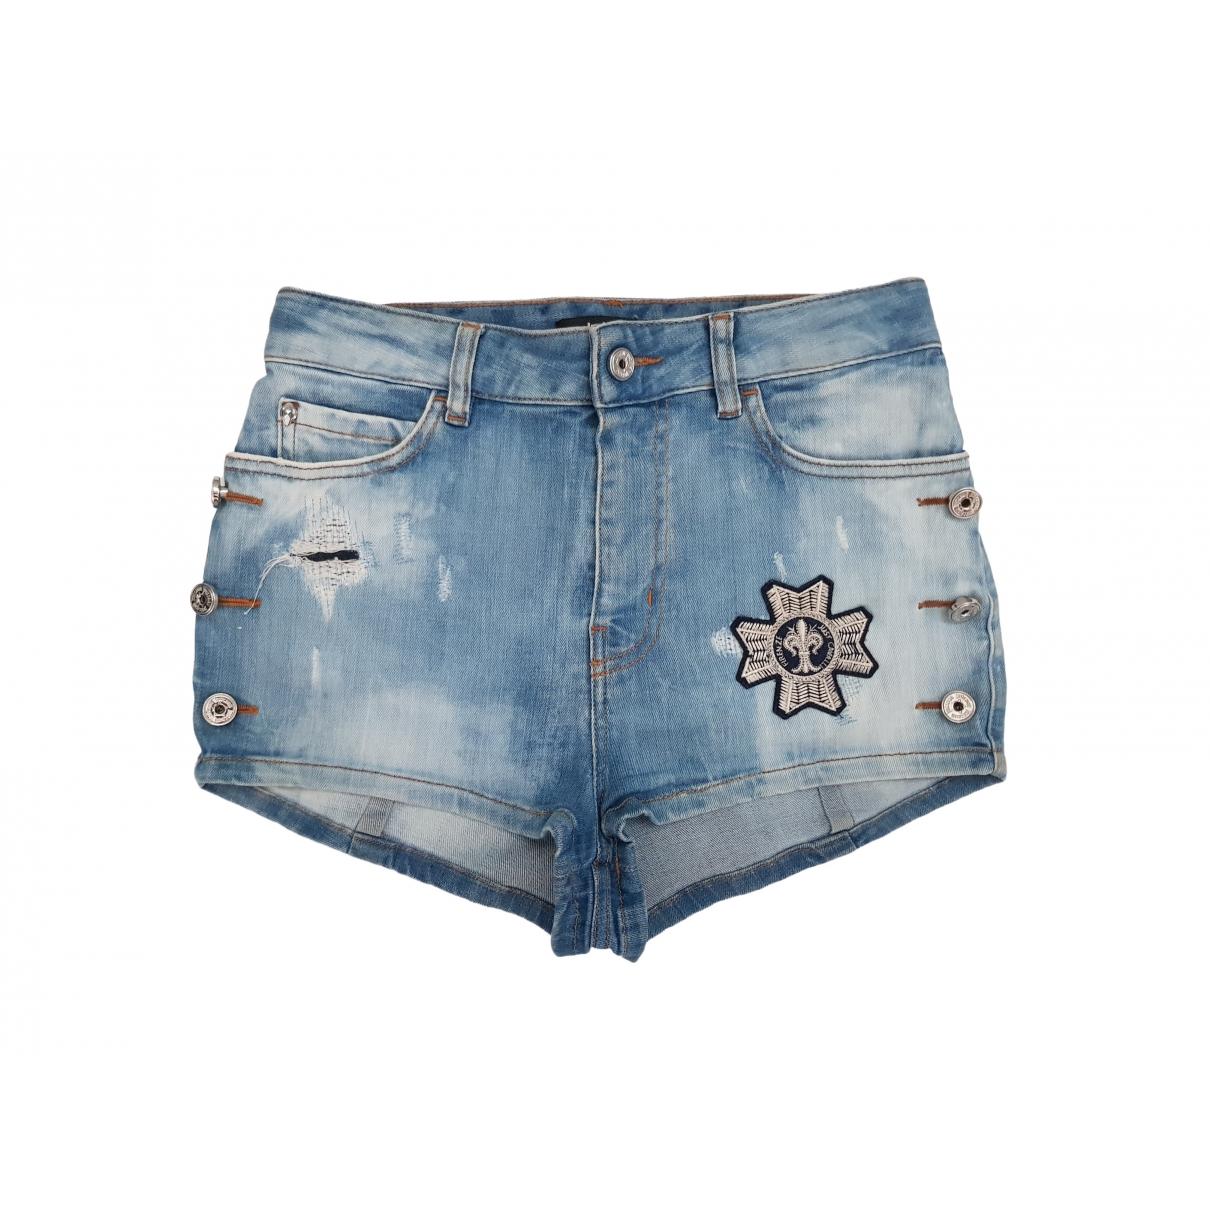 Just Cavalli \N Blue Denim - Jeans Shorts for Women 40 IT